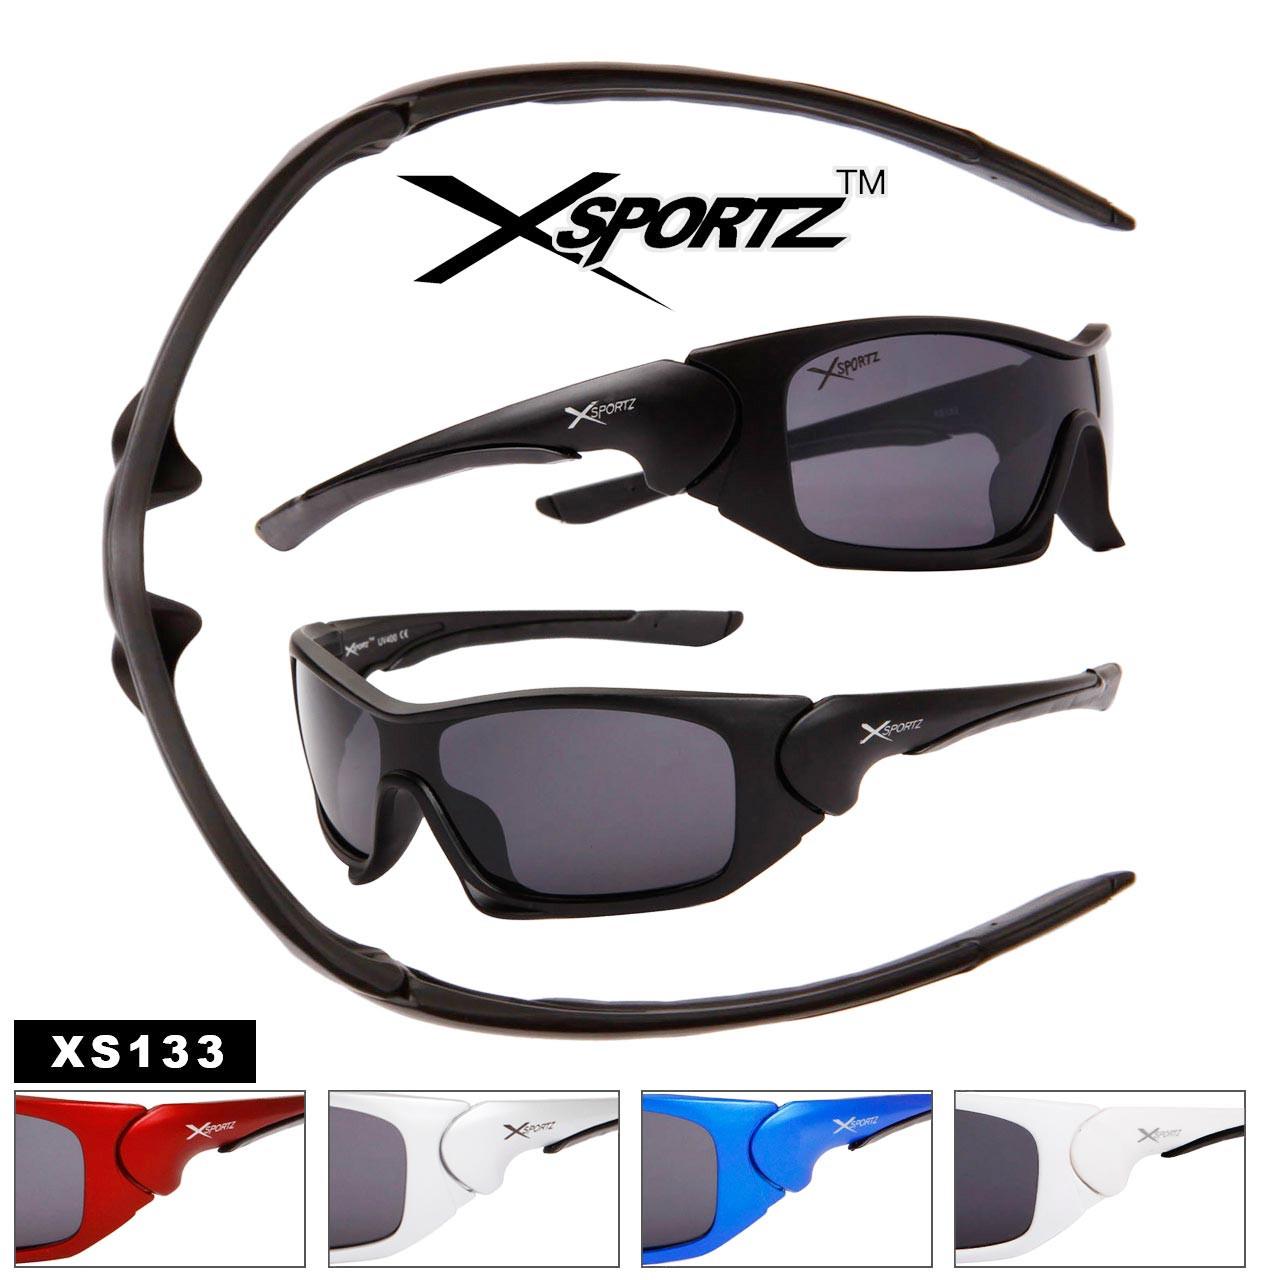 Xsportz Wholesale Sunglasses XS133